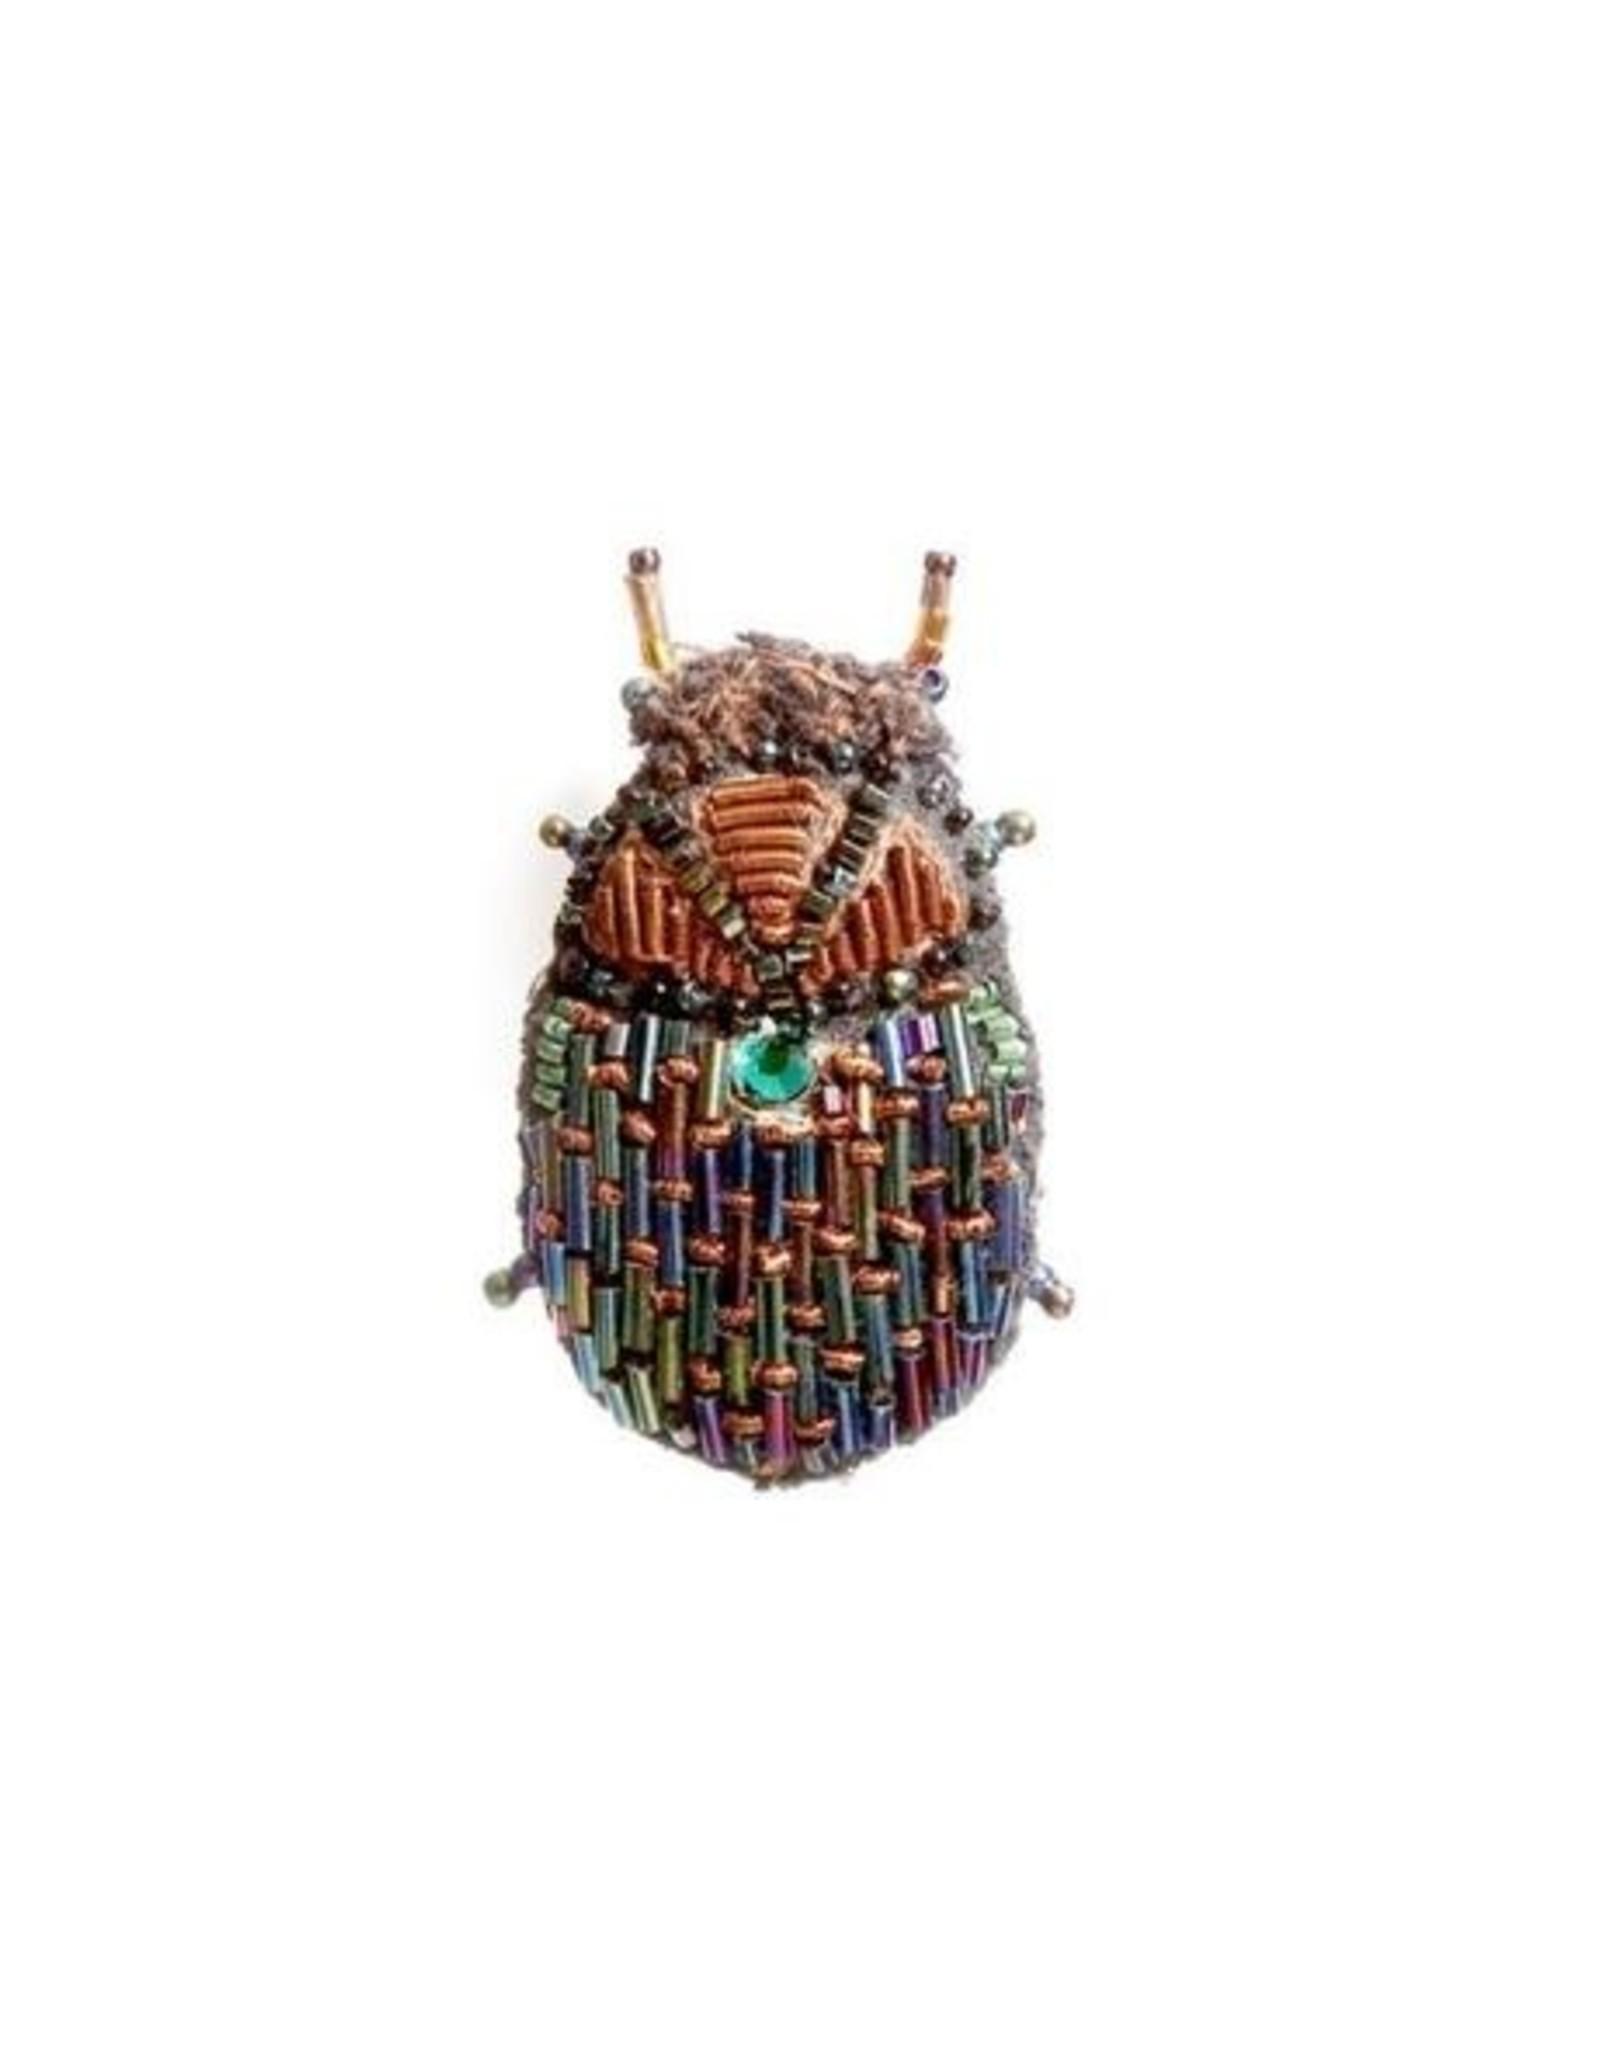 Scarab Beetle Brooch Pin